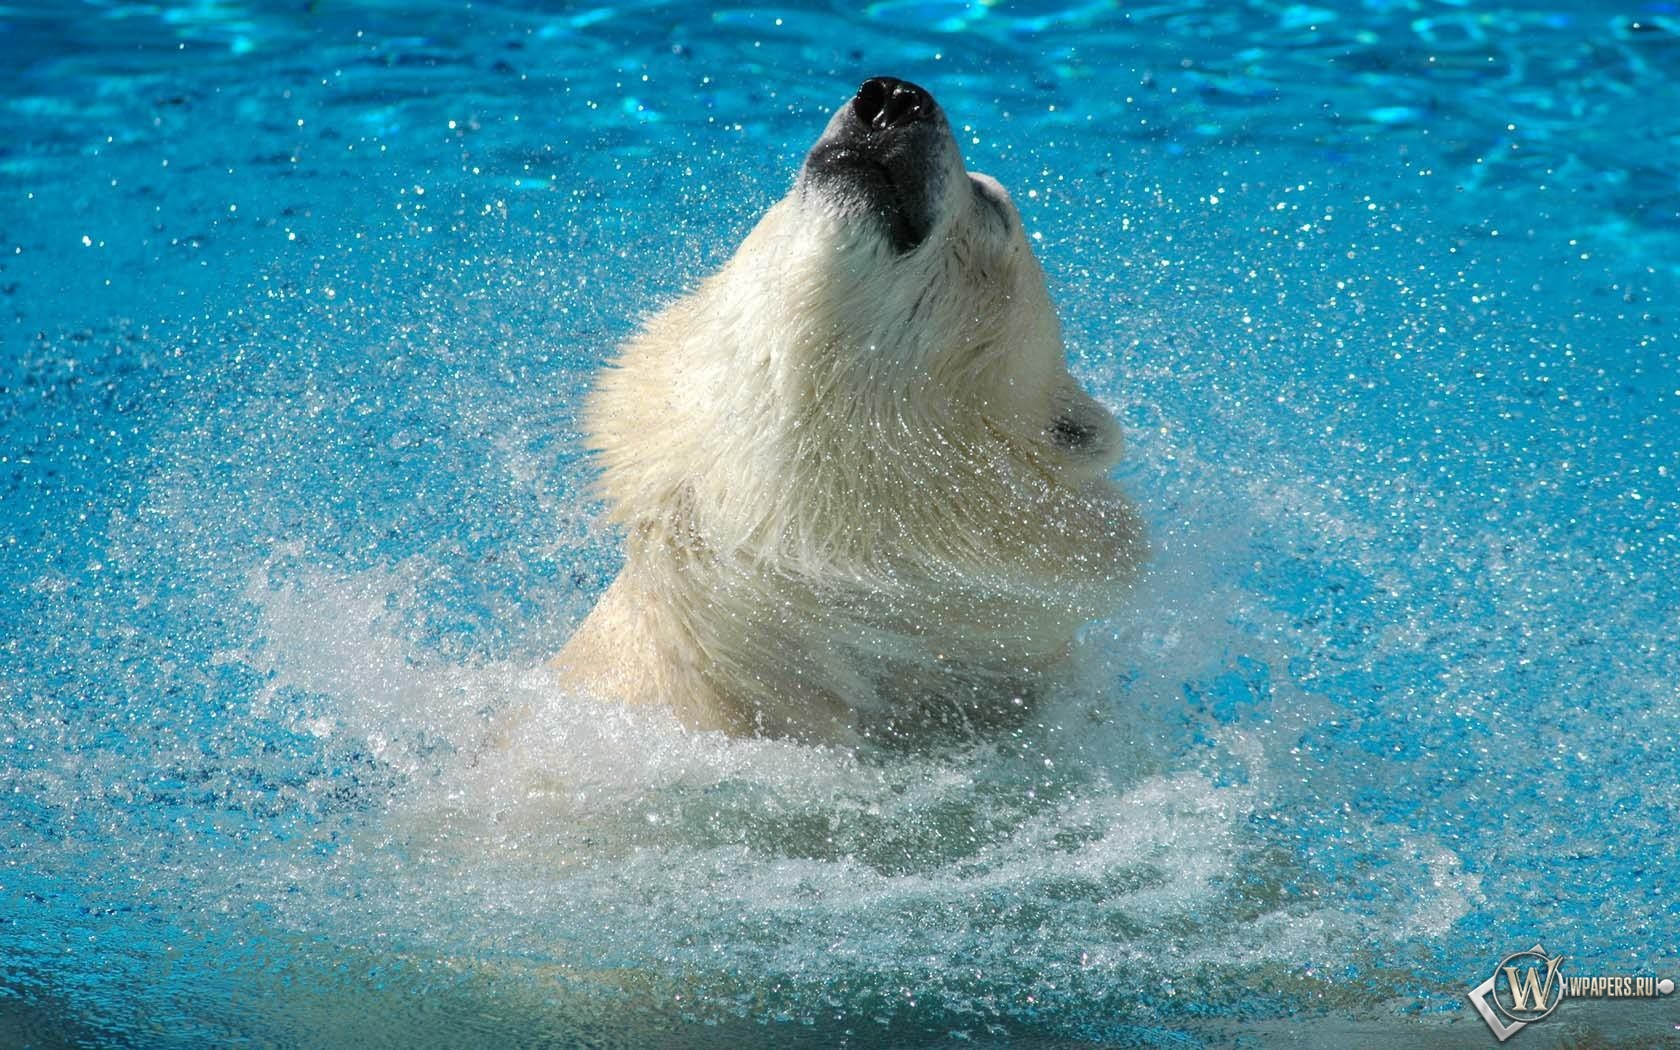 Медведь в воде 1680x1050